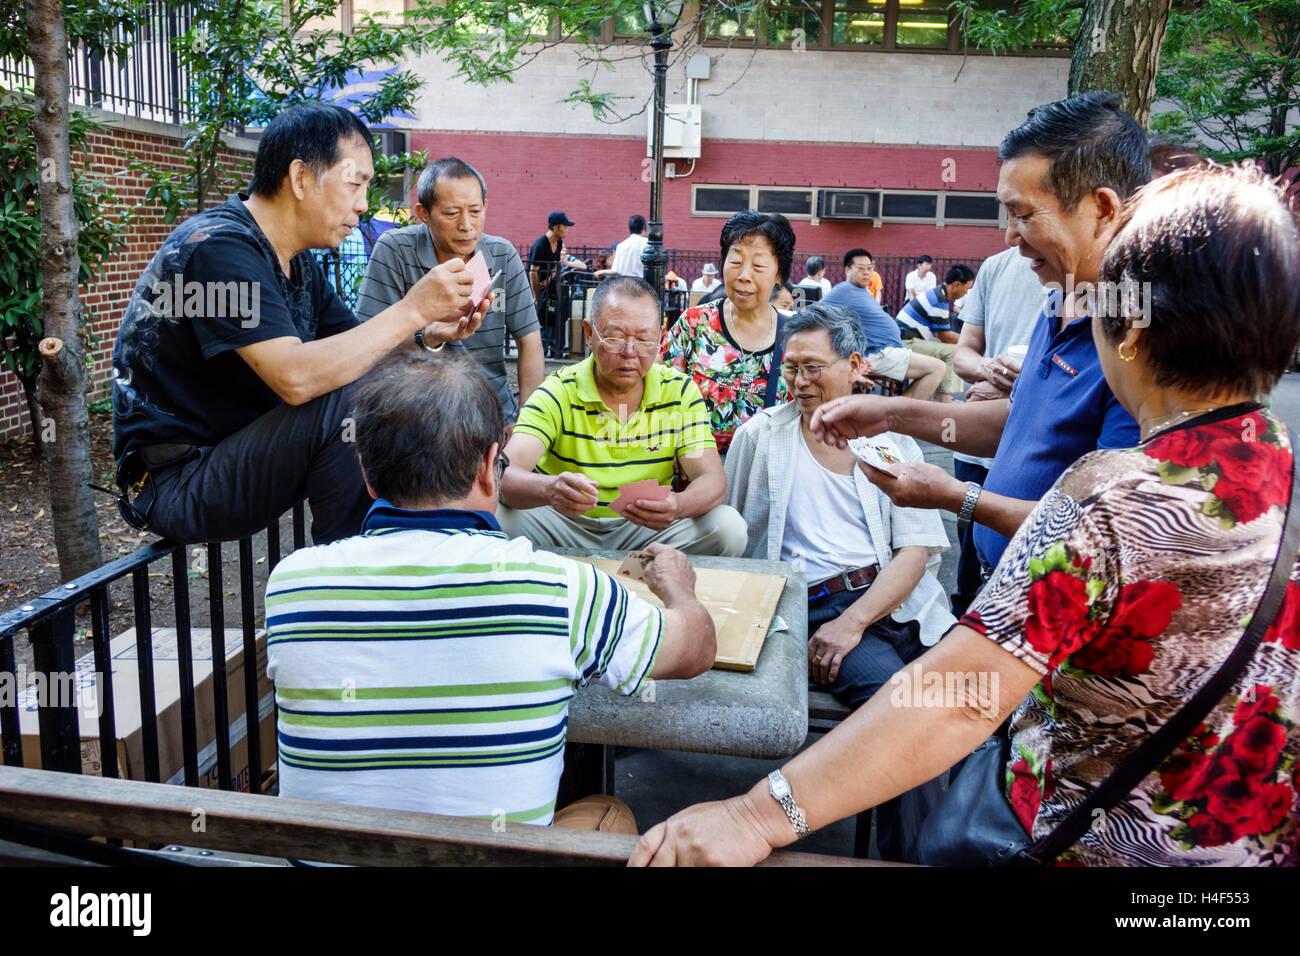 Manhattan New York City NYC NY Lower East Side Sara Delano Roosevelt Park neighborhood park Asian man mature leisure - Stock Image